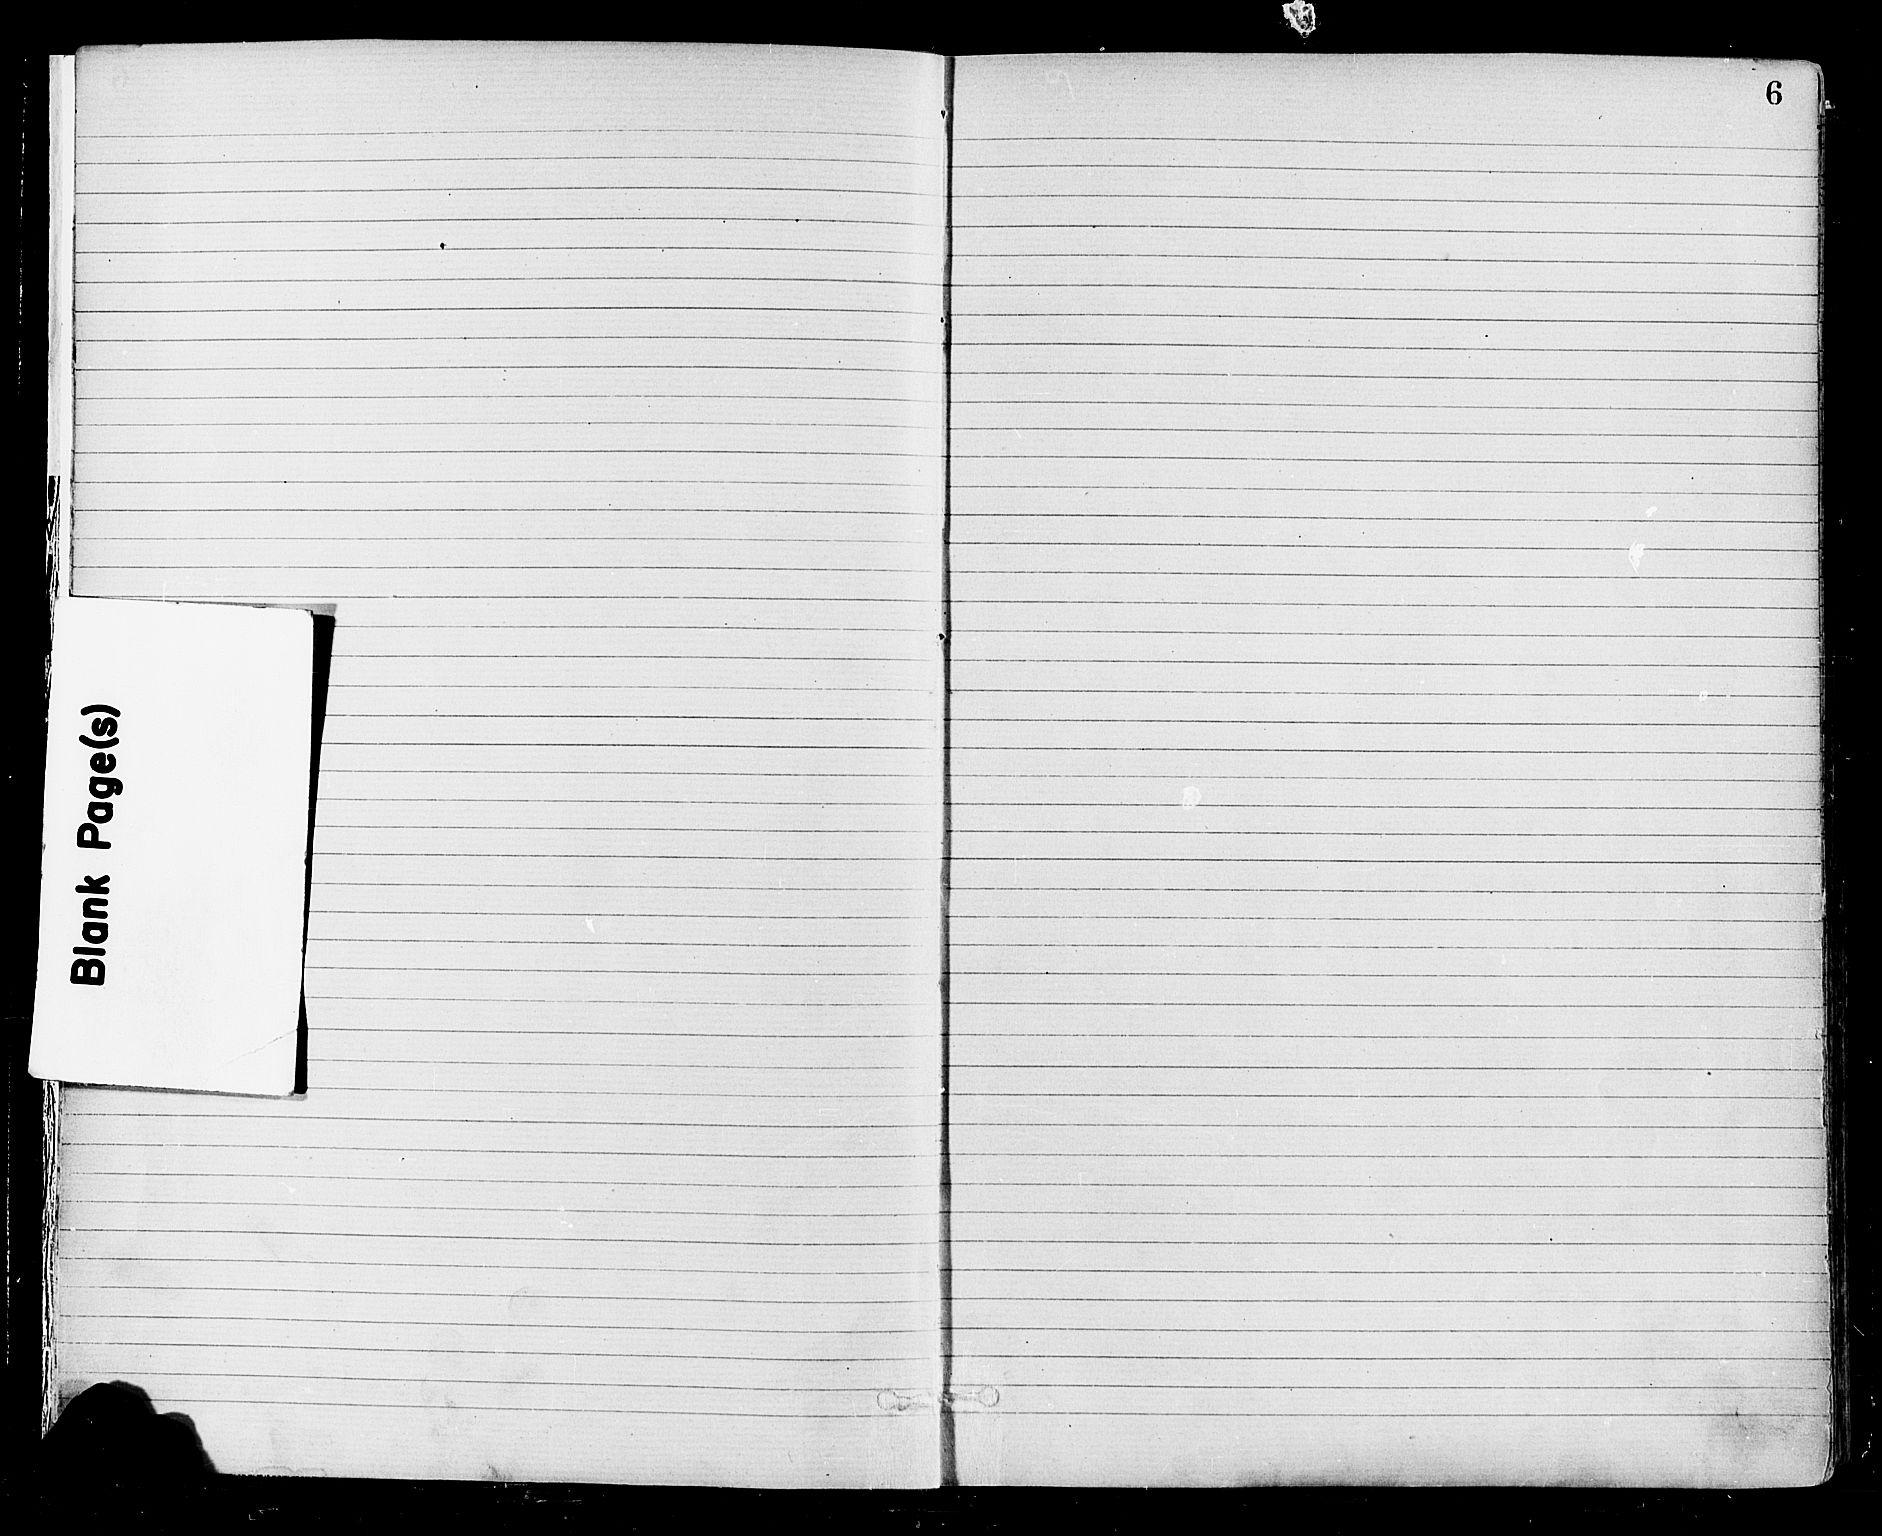 SAH, Jevnaker prestekontor, Ministerialbok nr. 8, 1877-1890, s. 6